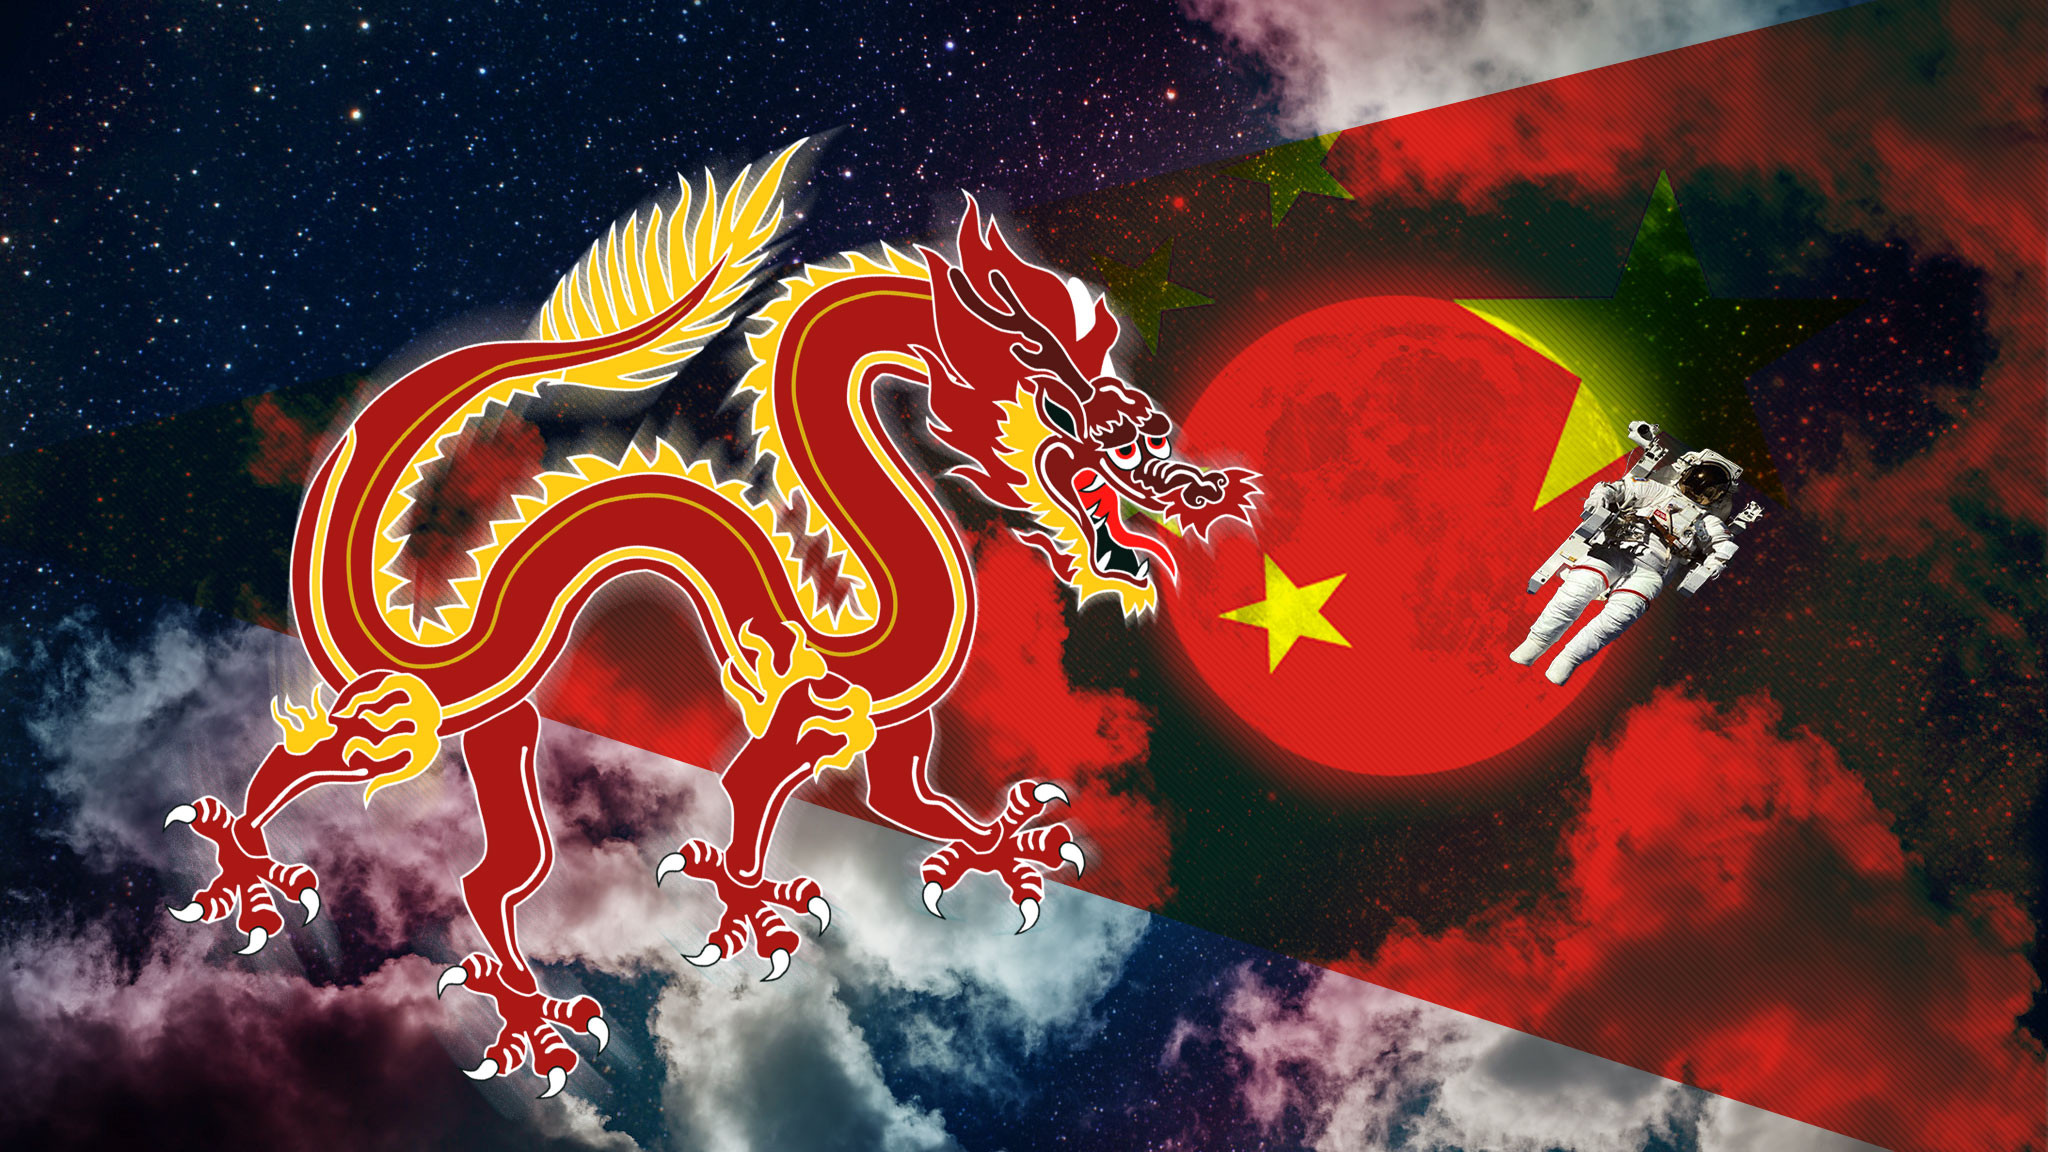 "<p>Коллаж &copy; L!FE &nbsp;Фото: &copy; <a href=""https://commons.wikimedia.org/wiki/File:Dragon_from_Chinese_Dragon_Banner.svg"" target=""_blank"">Wikipedia.org</a>, flickr / <a href=""https://www.flickr.com/photos/ajithdauk/31572069682/"" target=""_blank"">Ajith Kumar</a></p>"